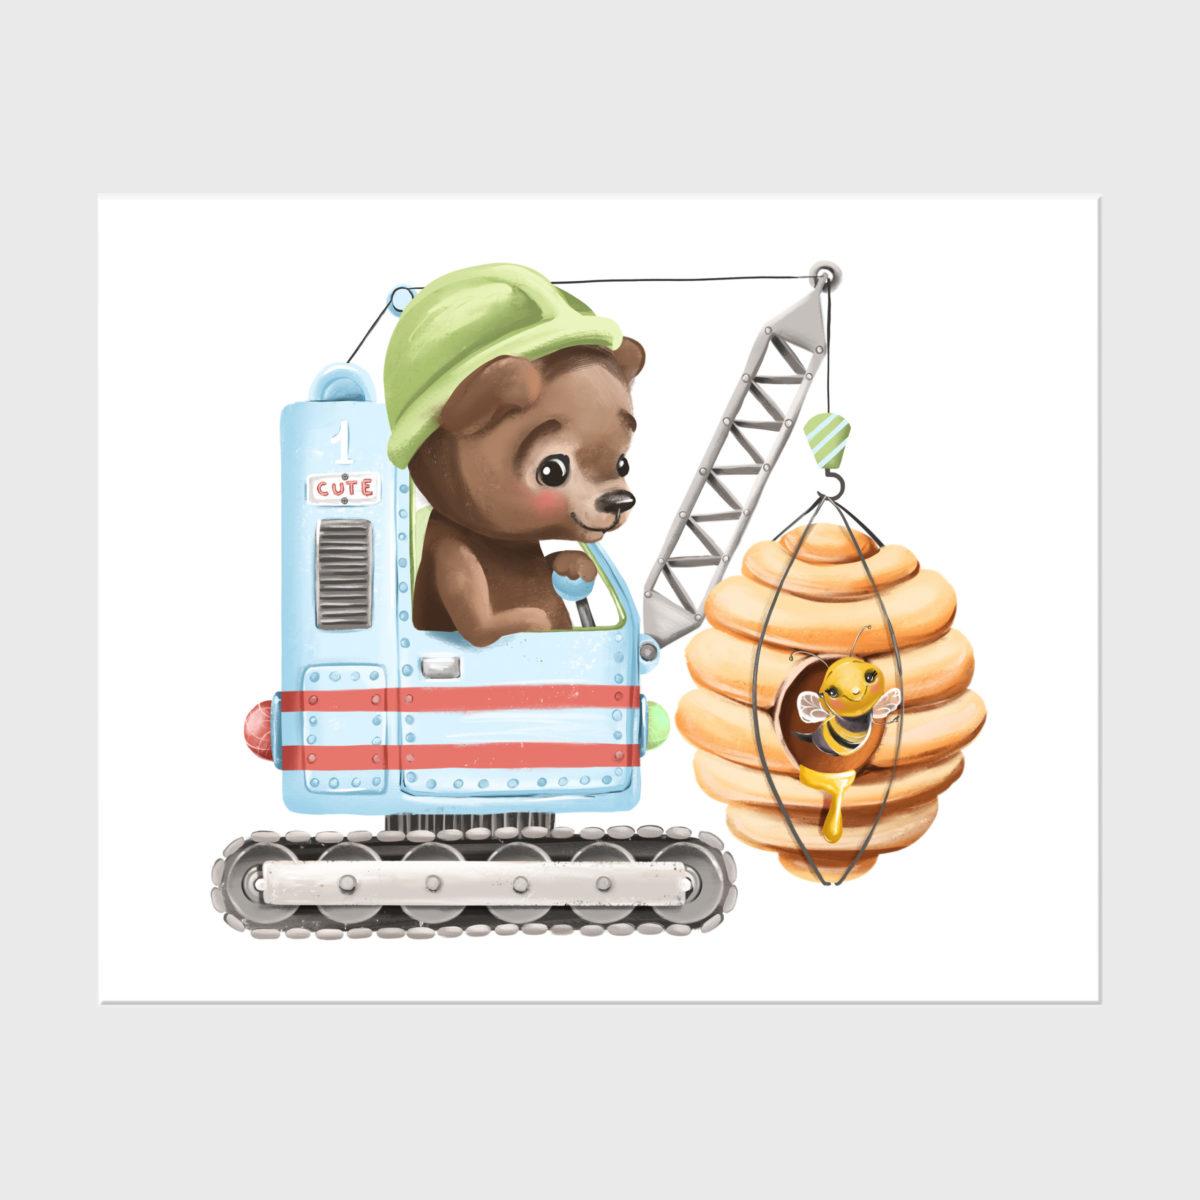 3. Baby builder bear